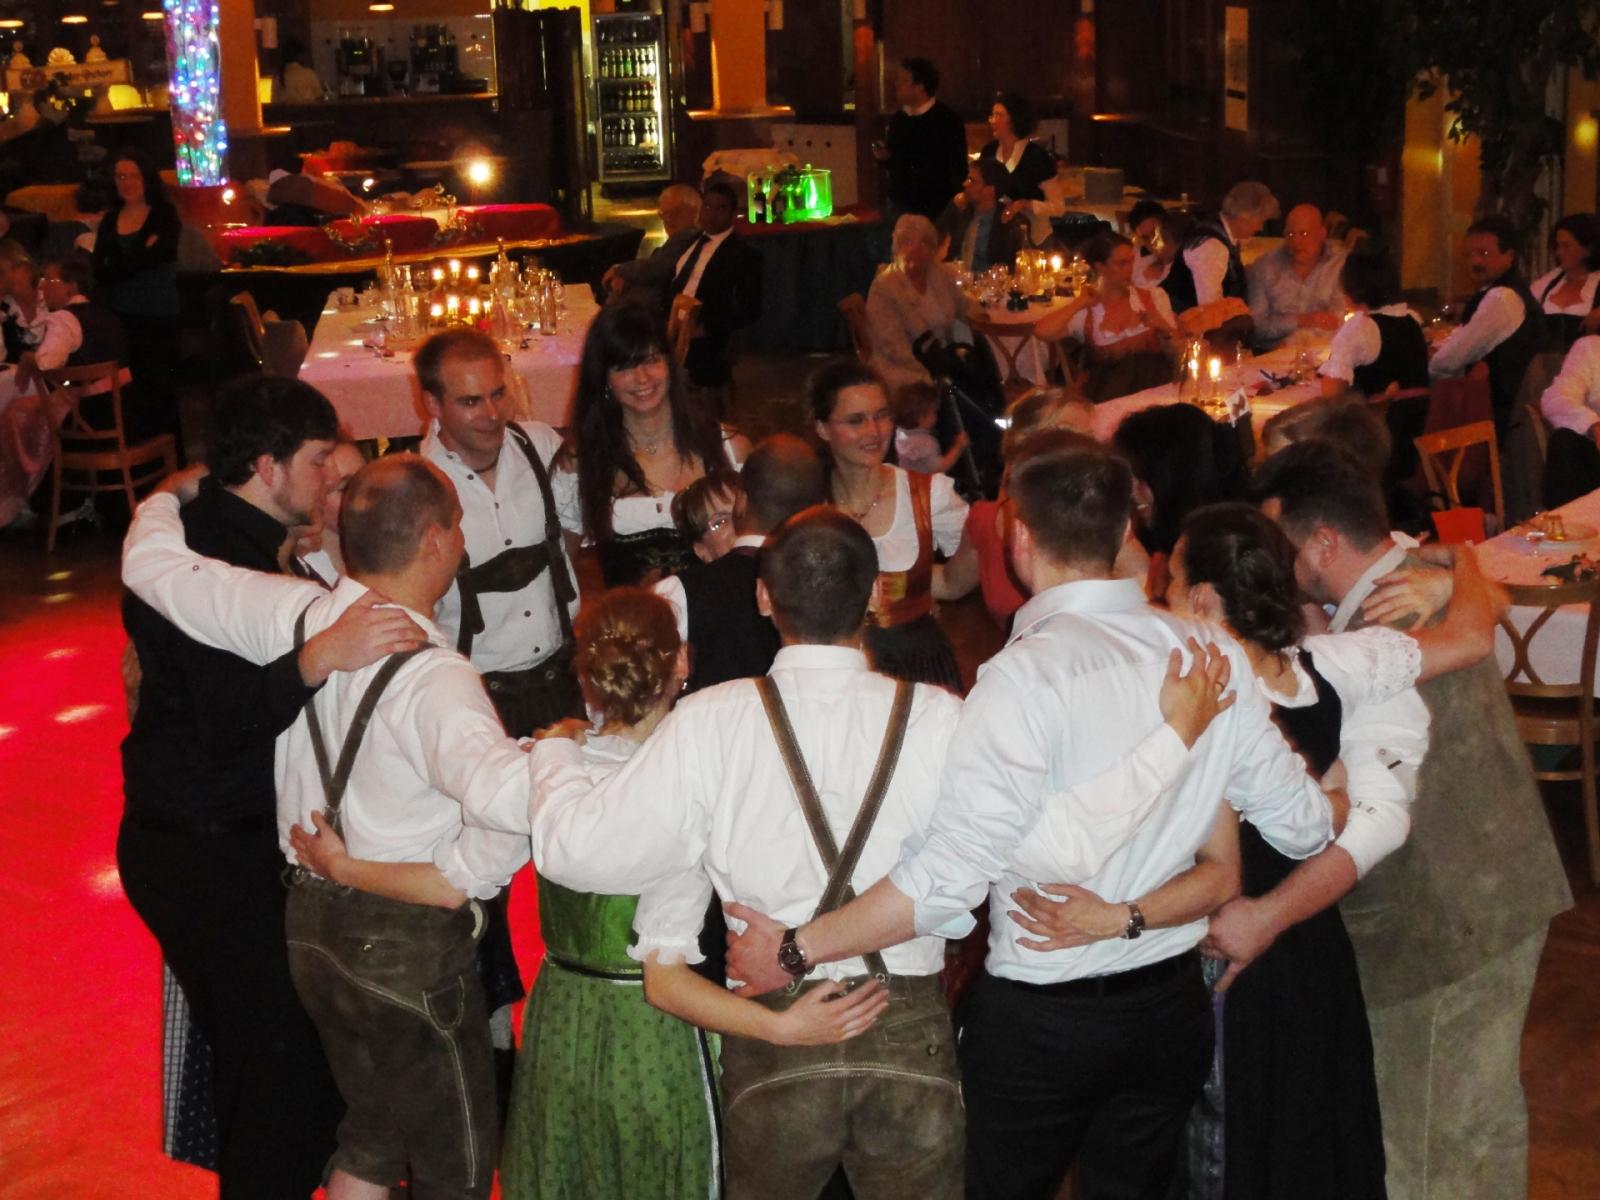 party-stimmung-mit-dj-hoasi